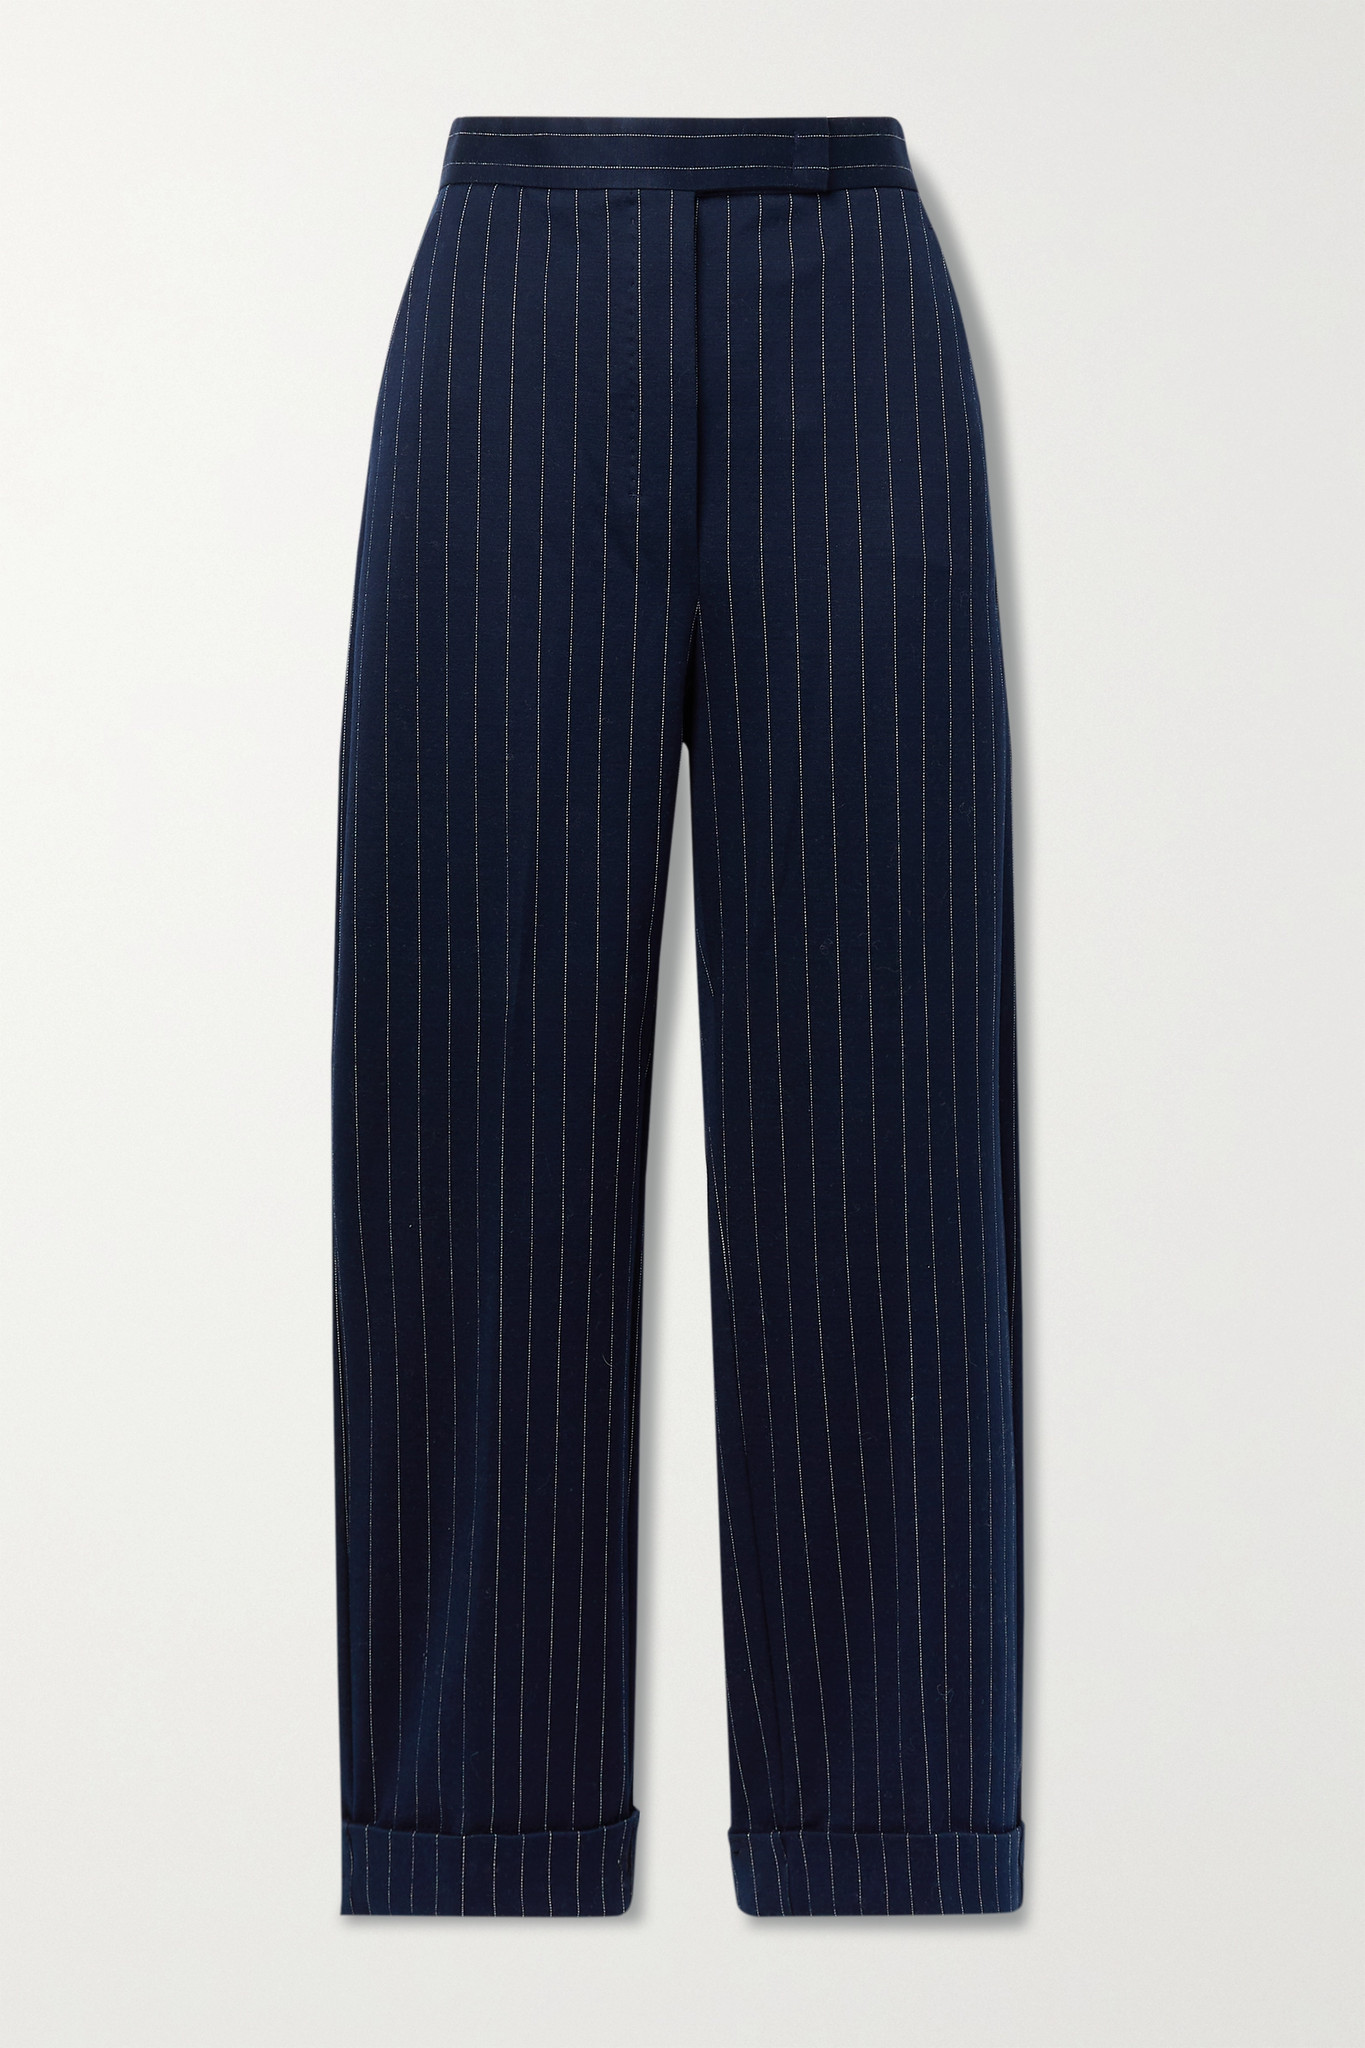 MAX MARA - Valanga 细条纹弹力棉质混纺直筒裤 - 蓝色 - UK4